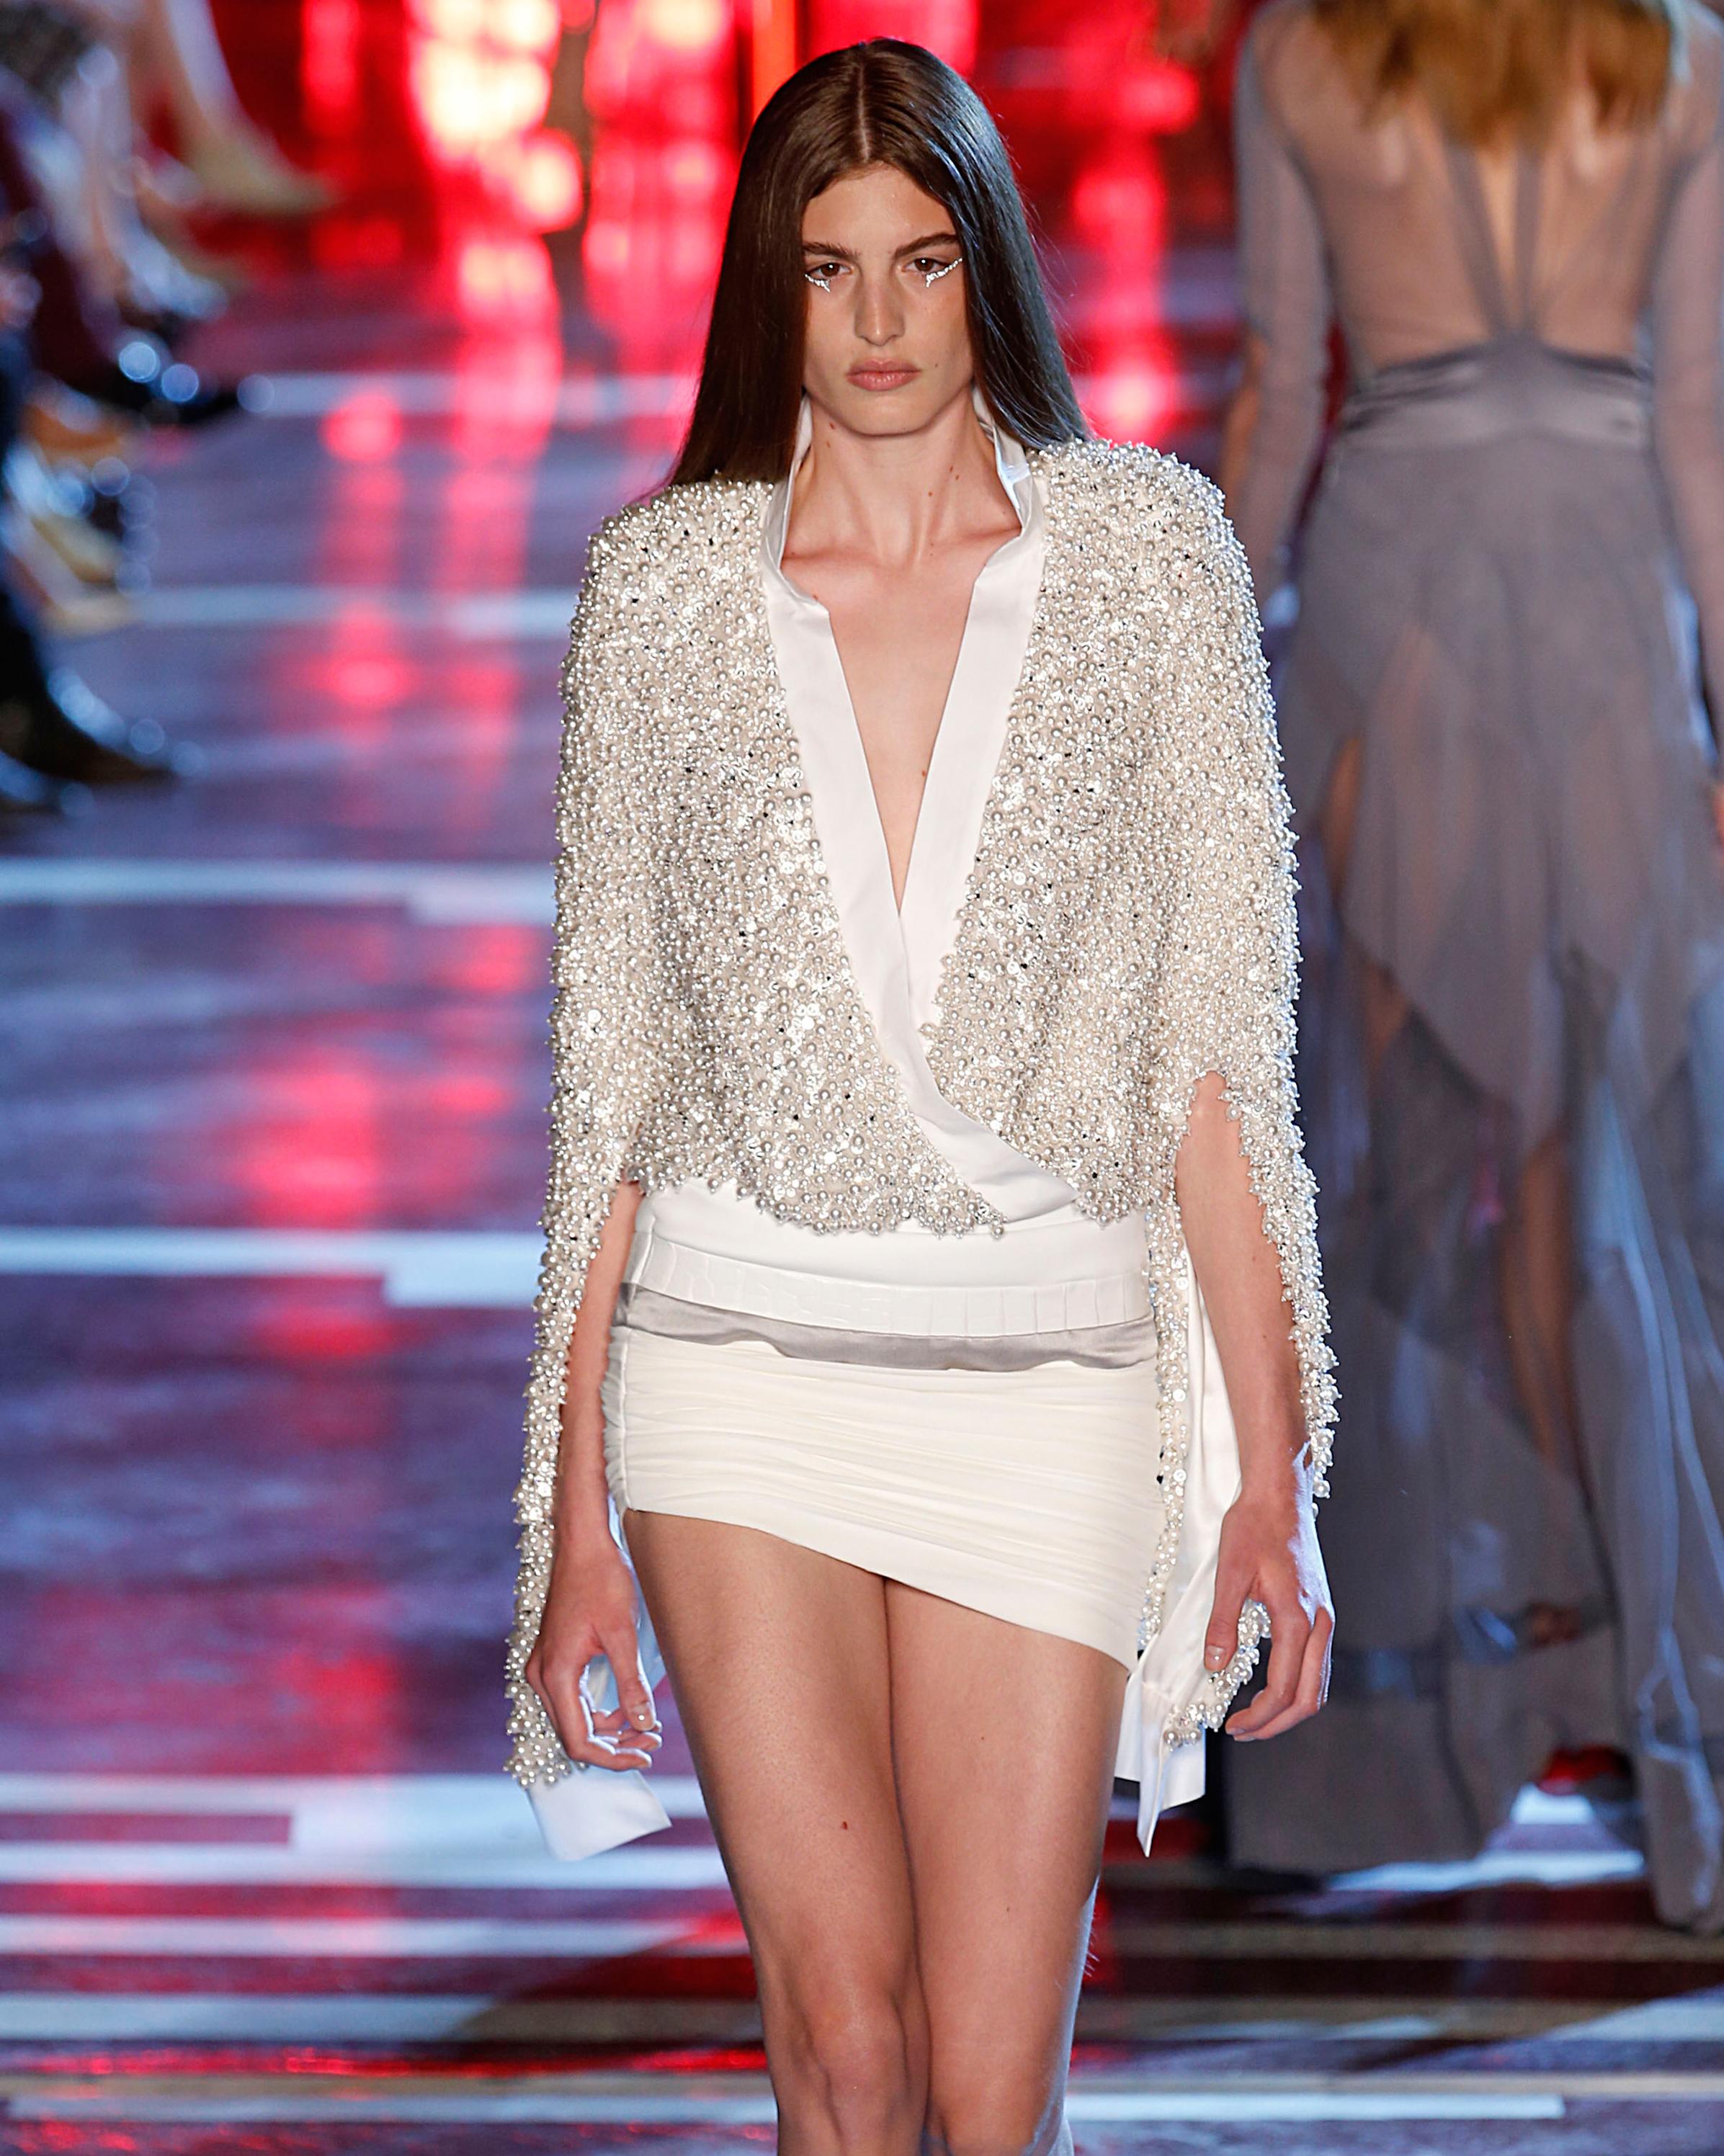 haute-couture-fall-2014-alexandre-vauthier-0714.jpg